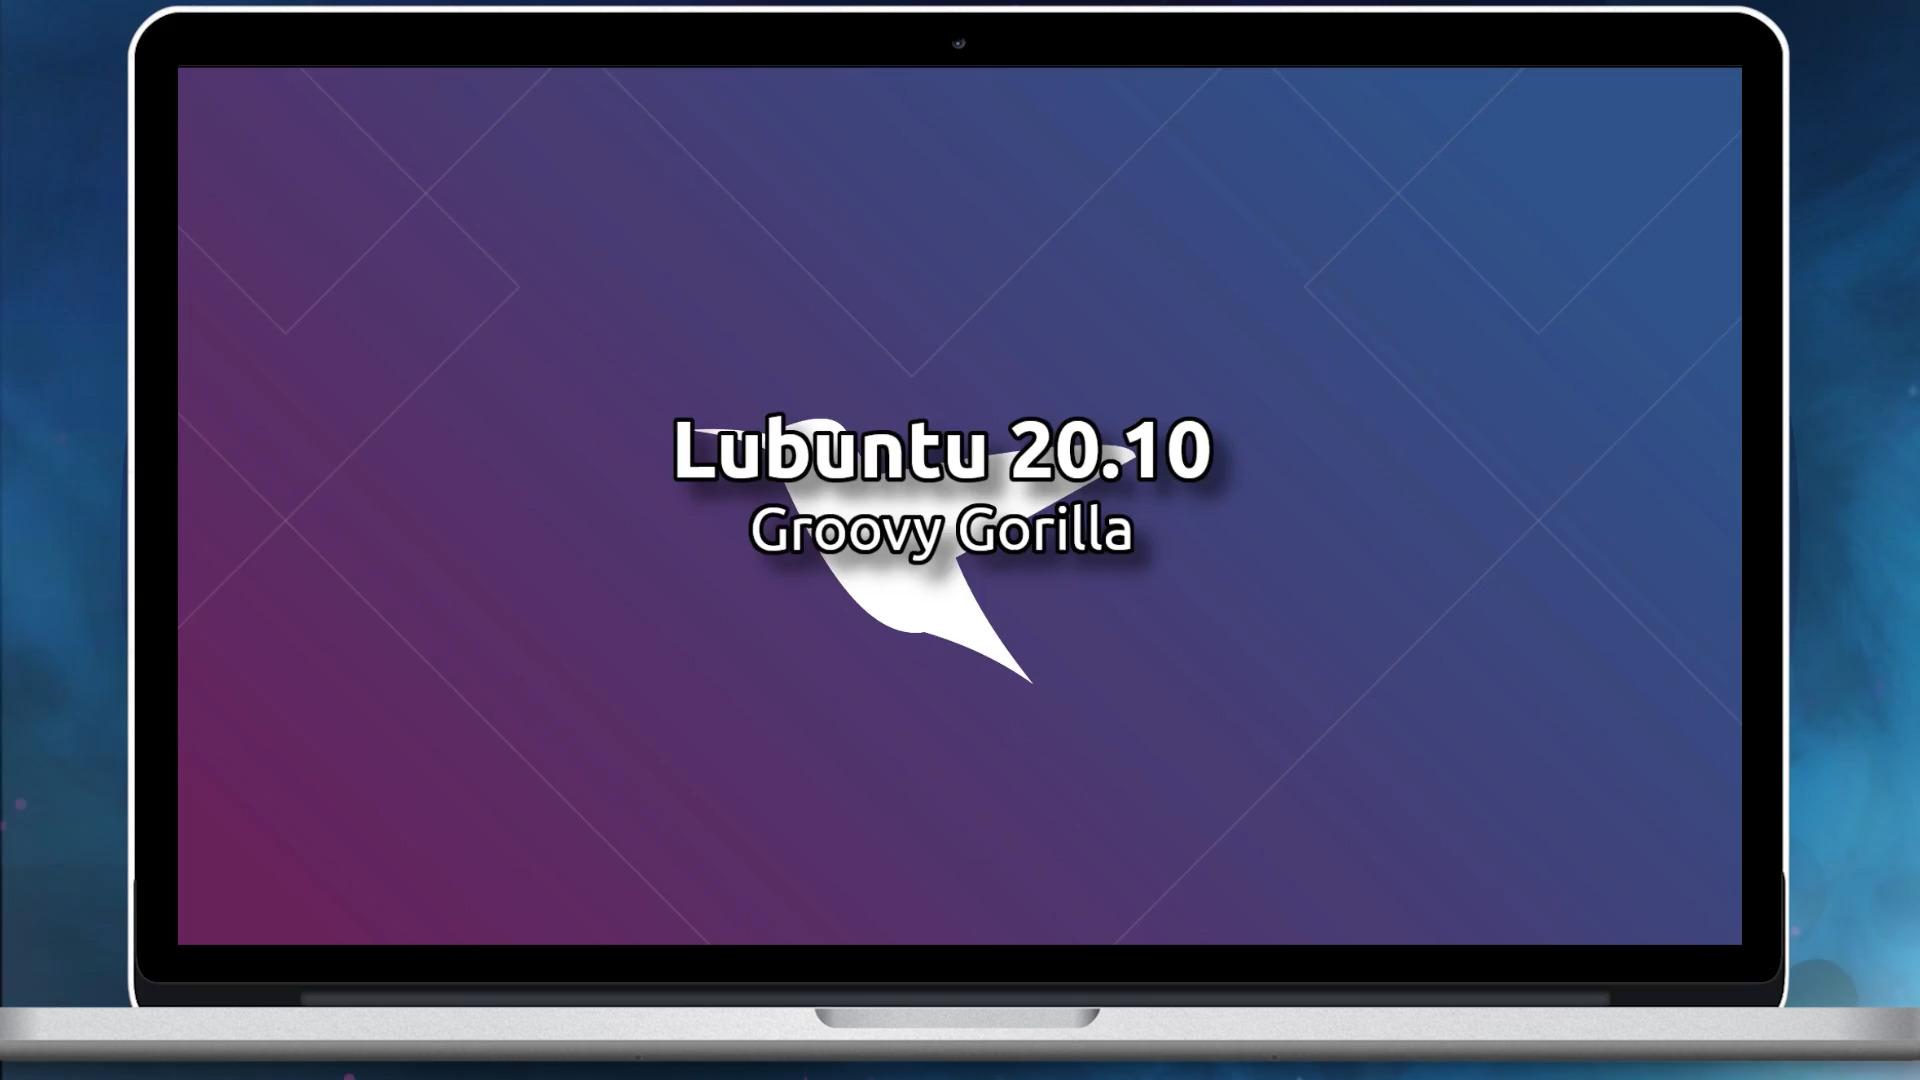 How to install Lubuntu 20.10 on Windows 10 Hyper-V